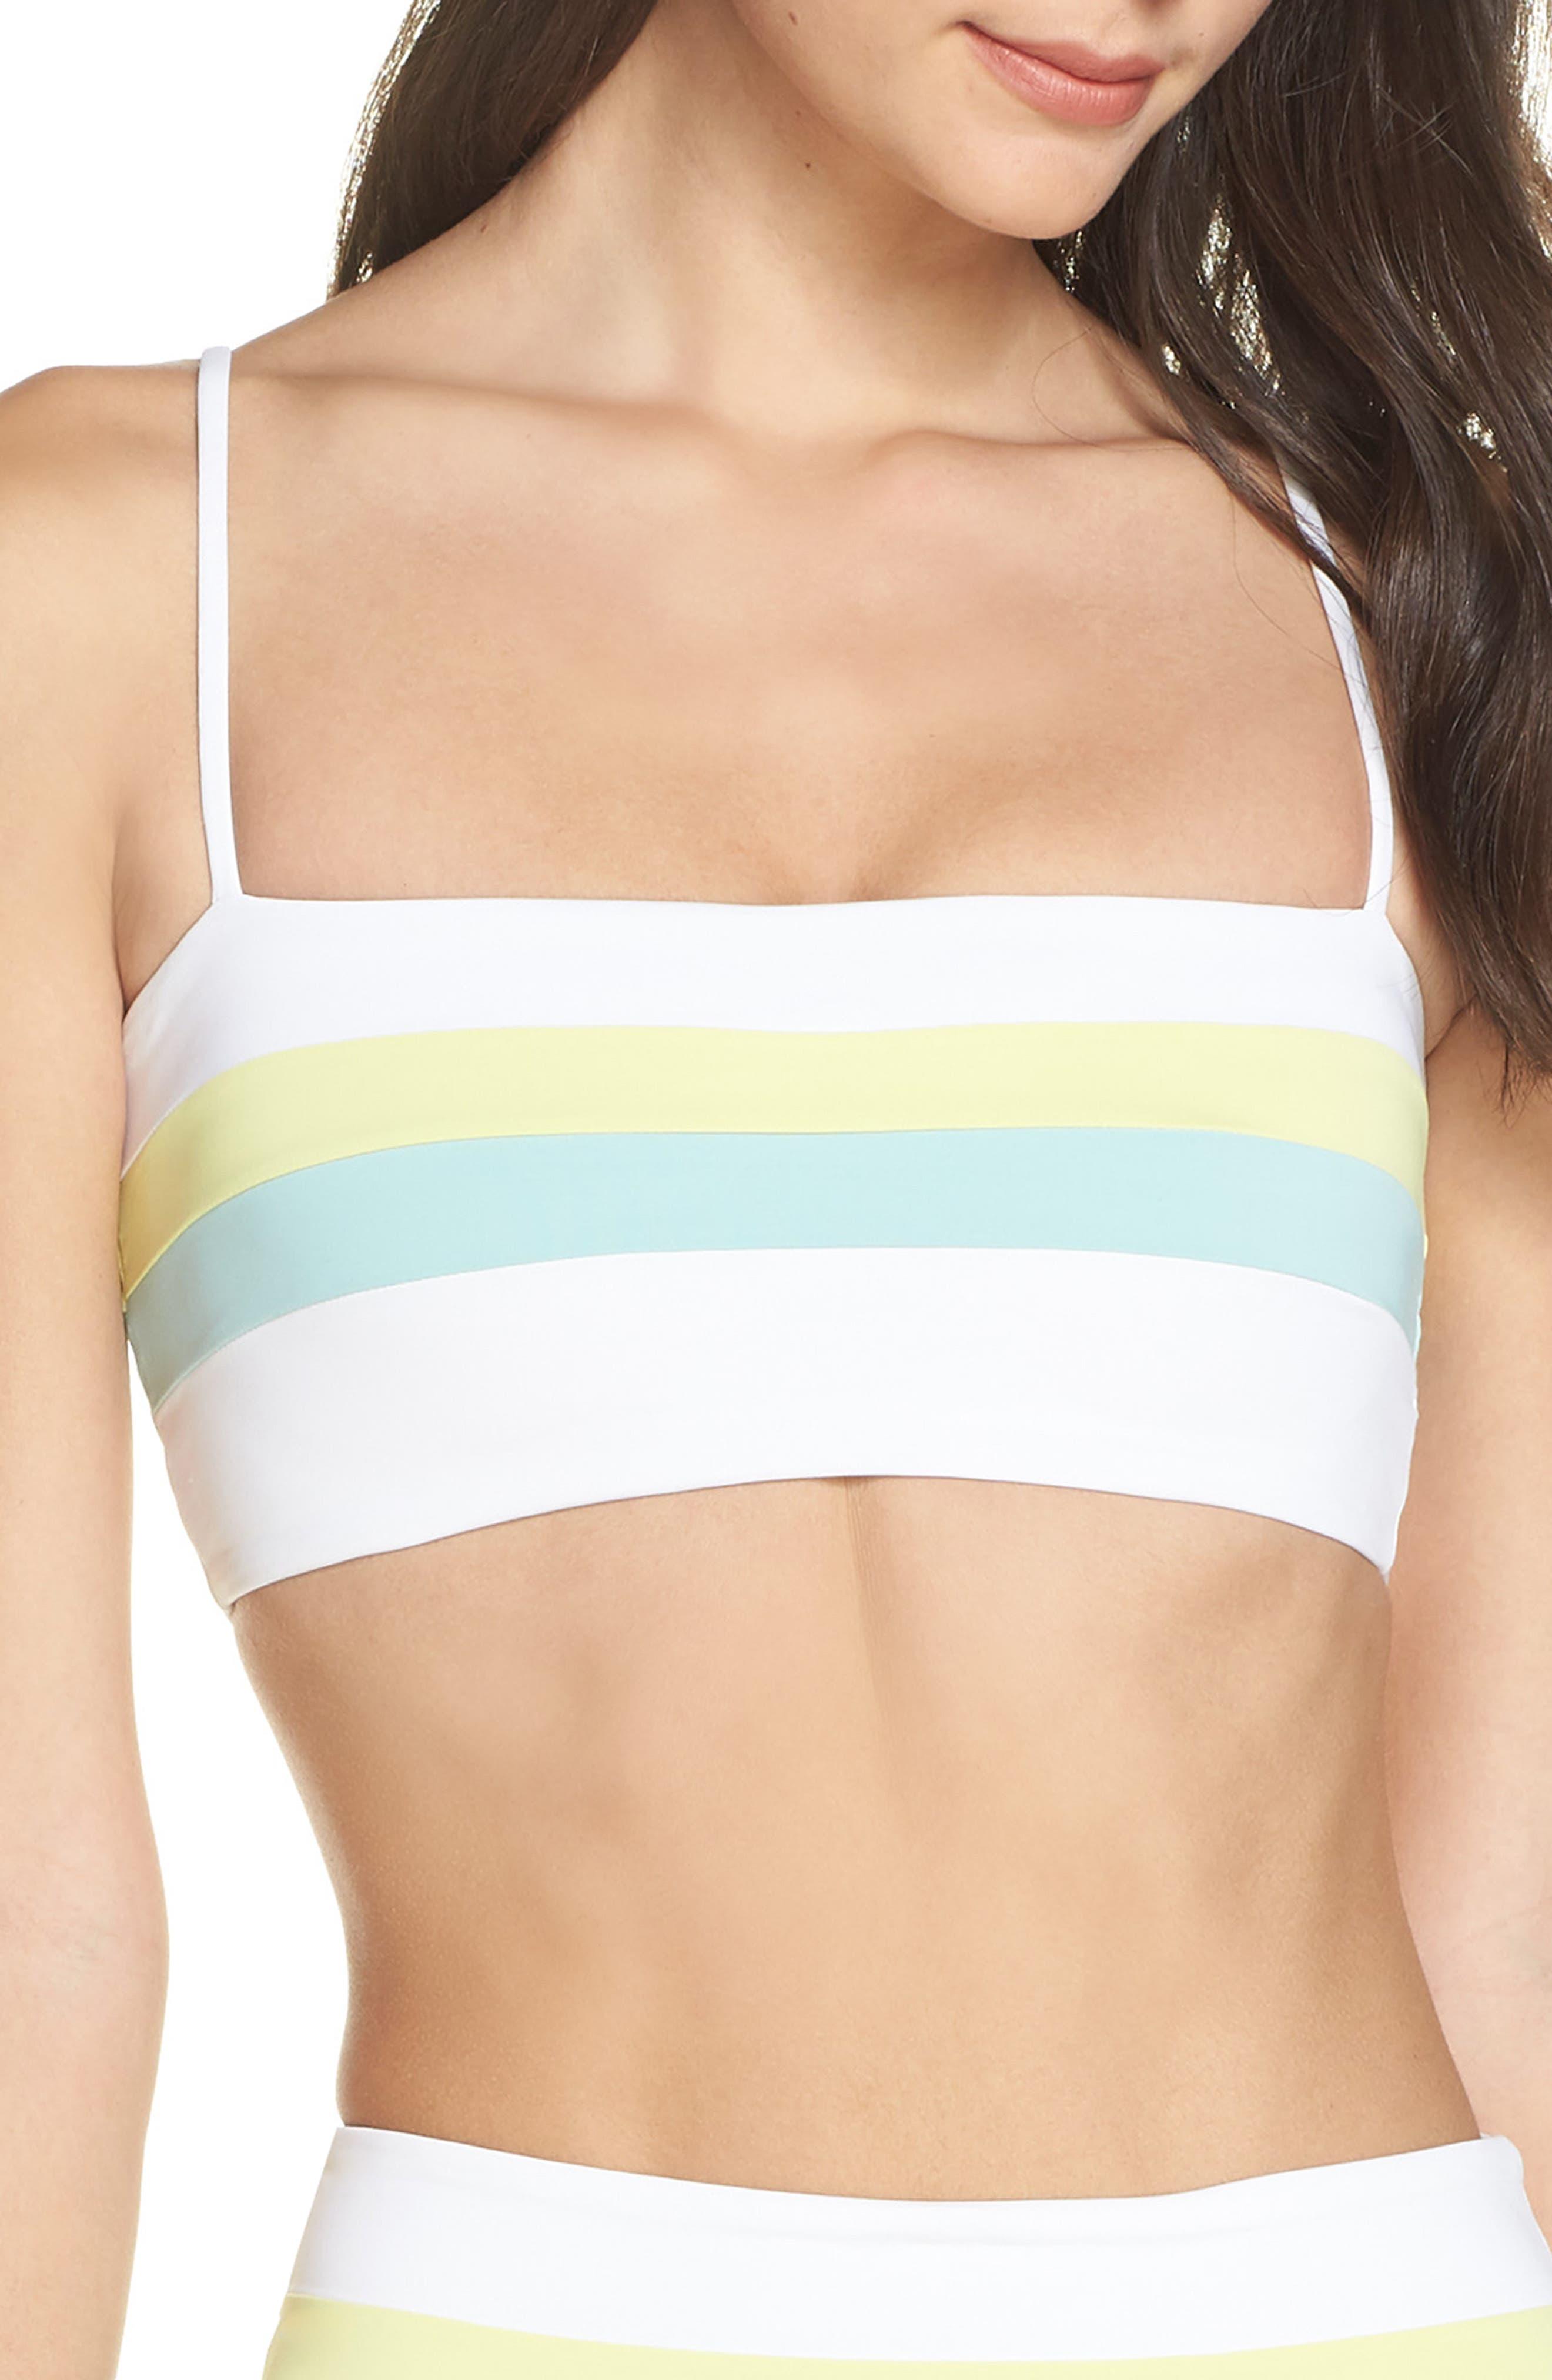 L SPACE Rebel Bikini Top, Main, color, WHITE/ LIGHT TURQ/ LEMONADE